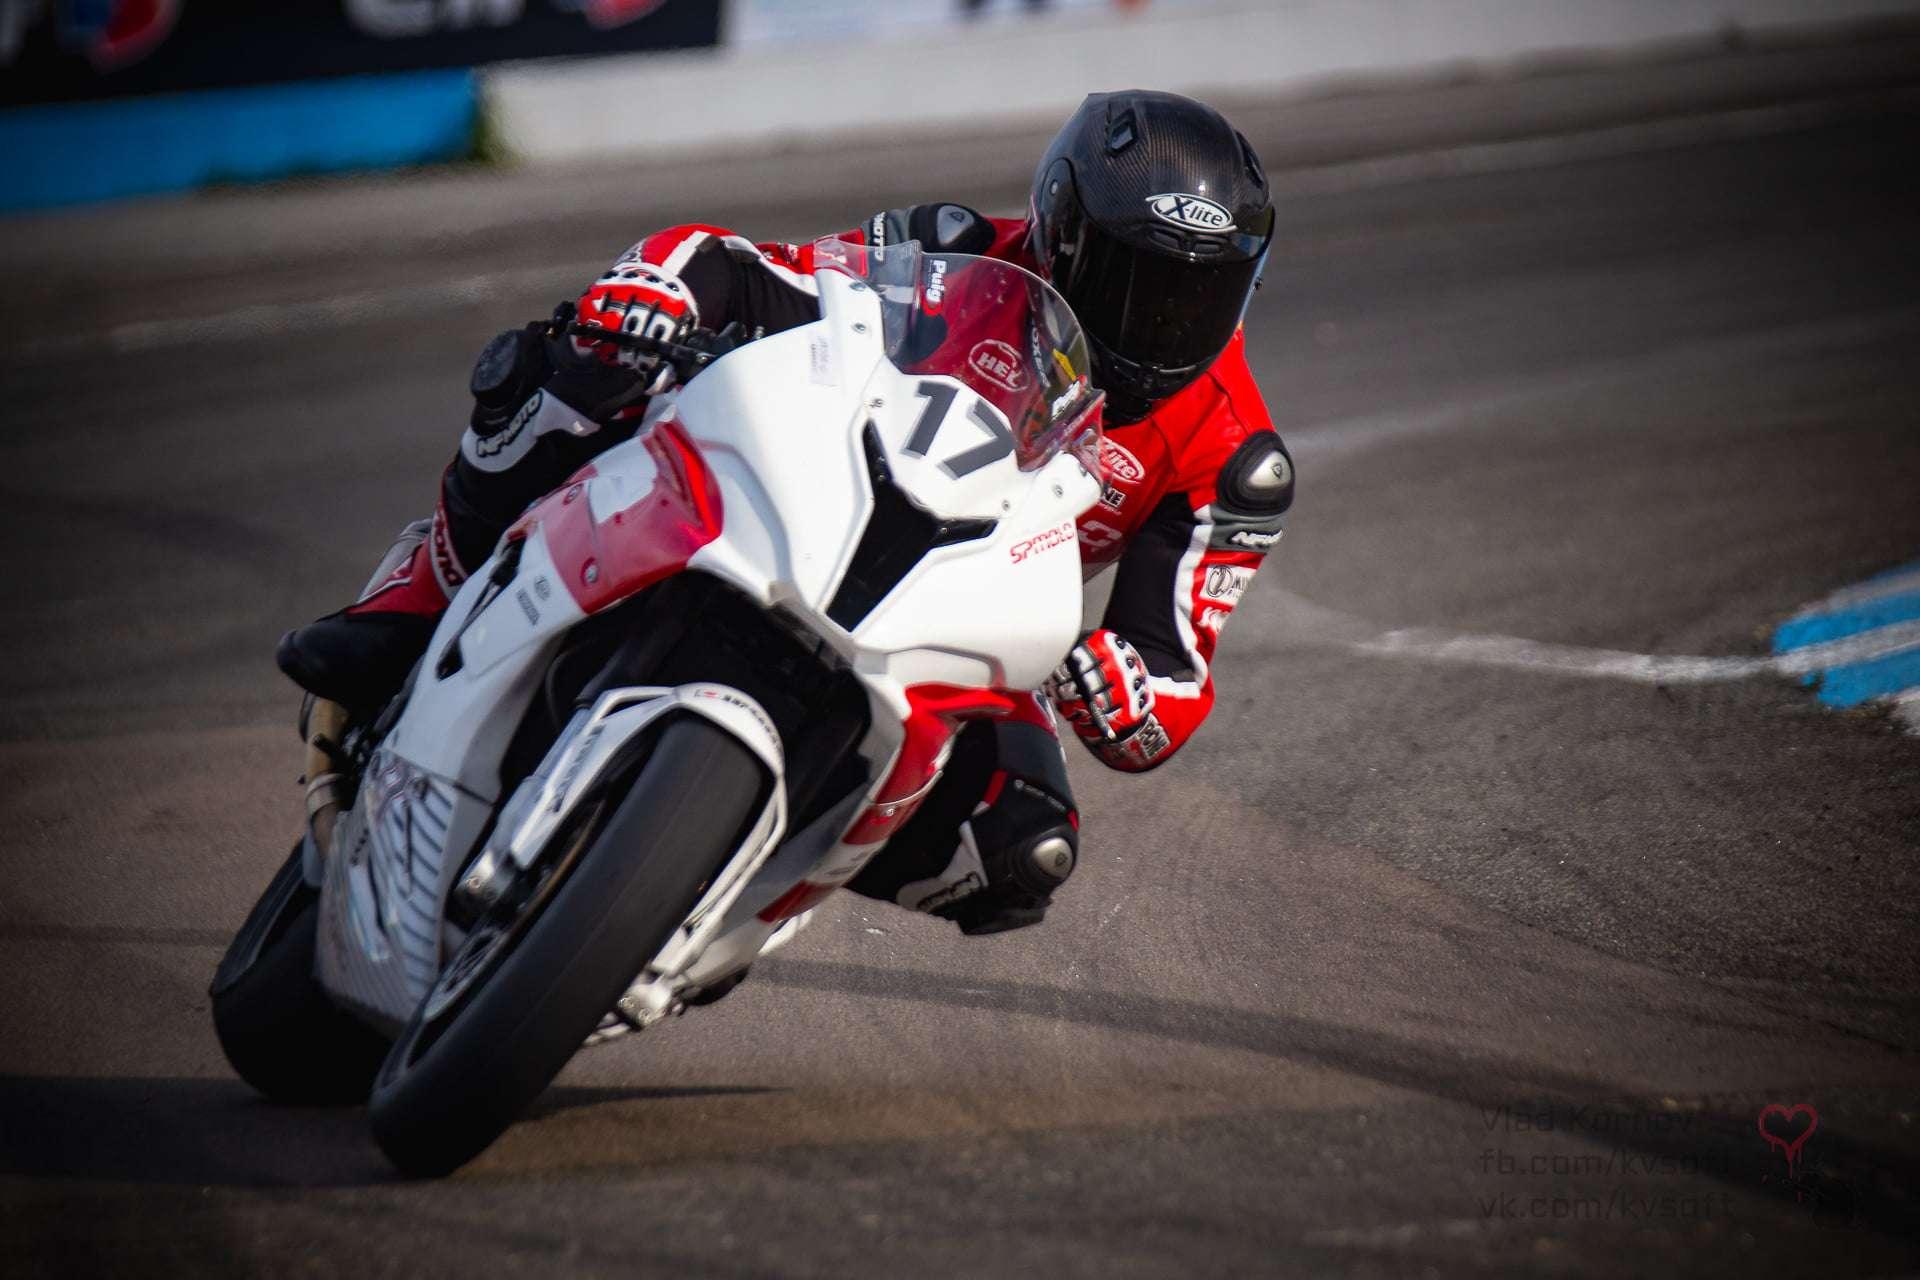 5-6_etap_MotoGPUkraine_087